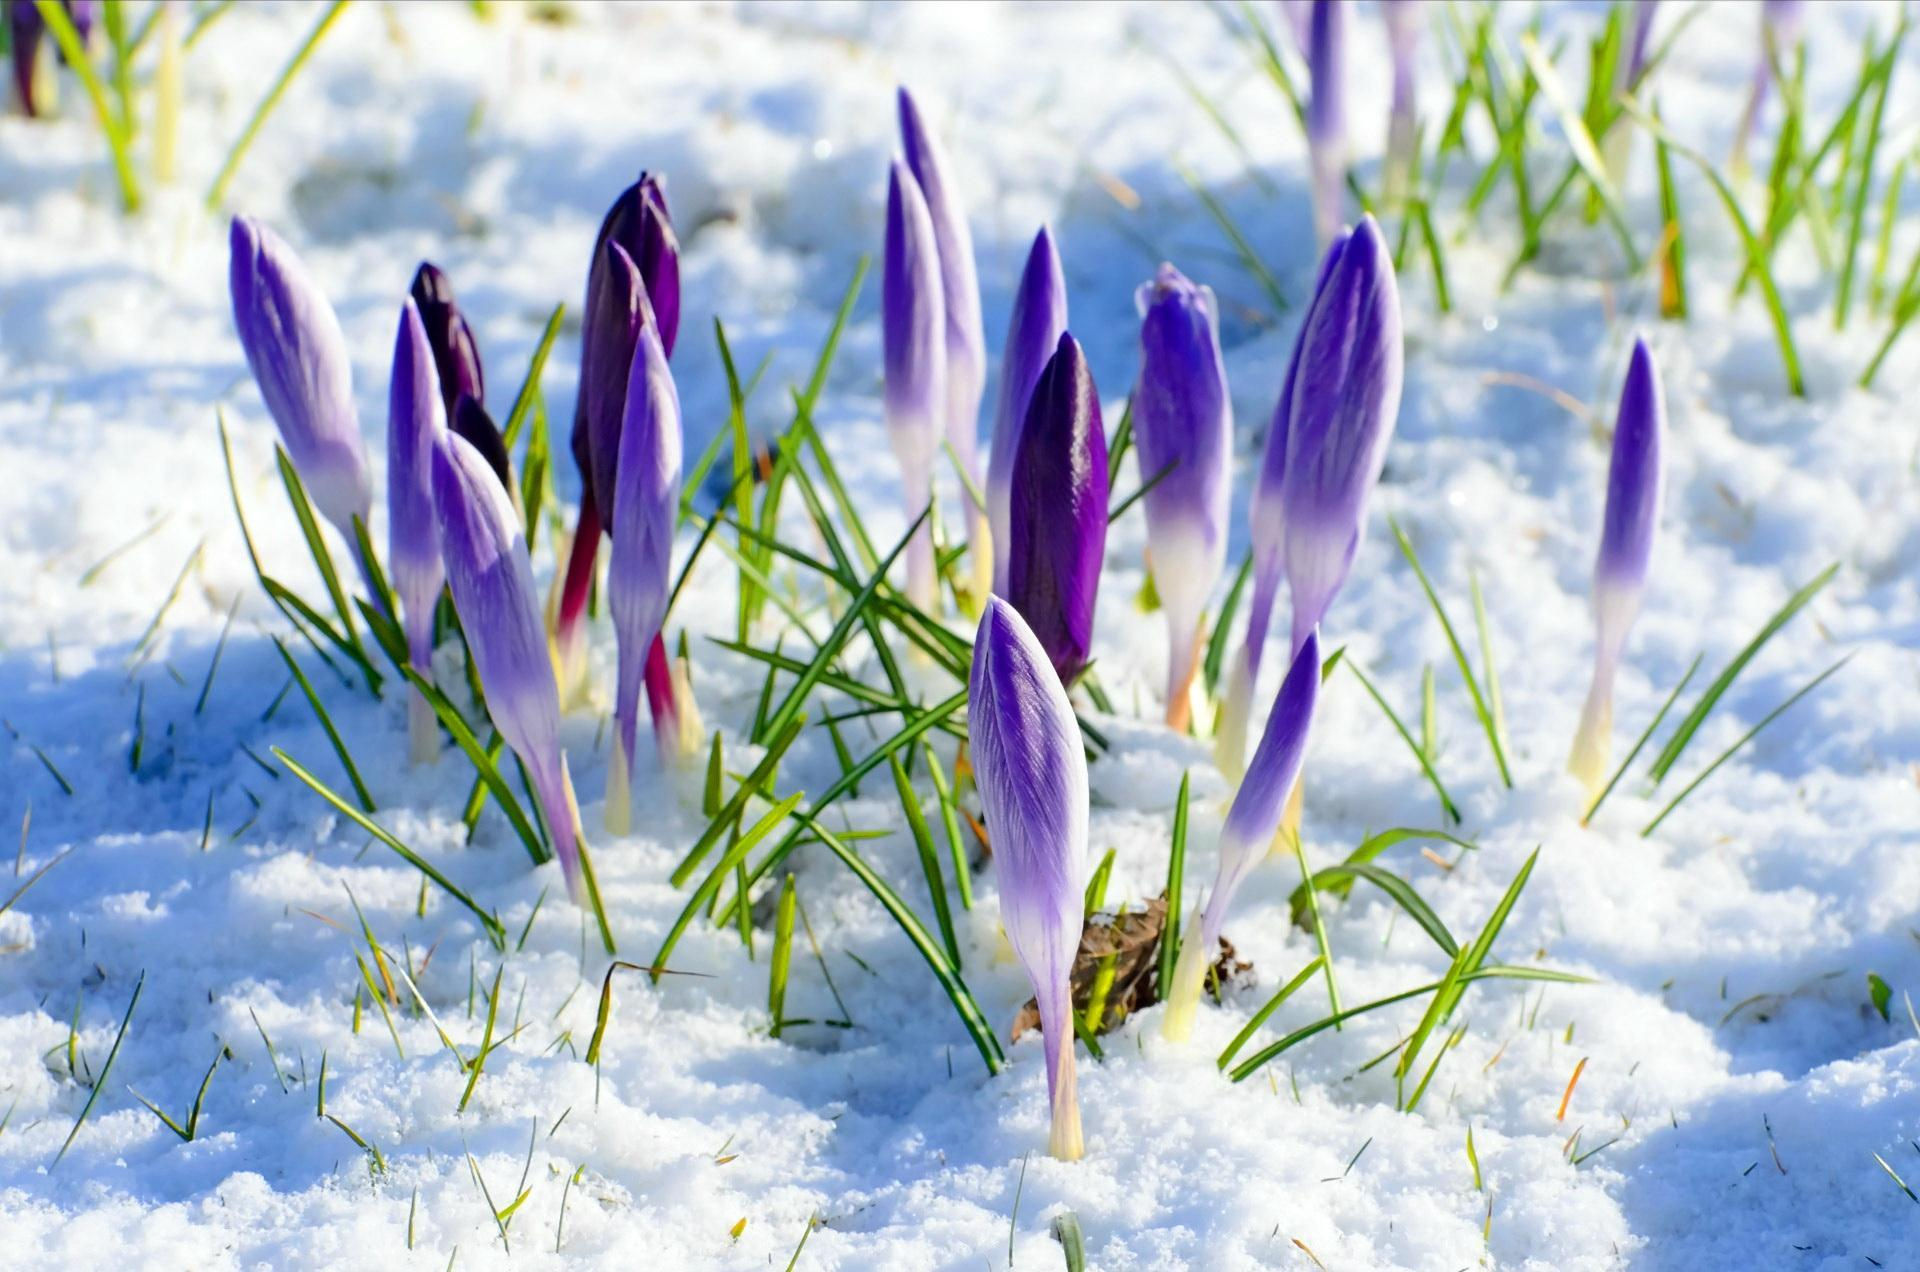 Flowers In Snow Wallpapers Top Free Flowers In Snow